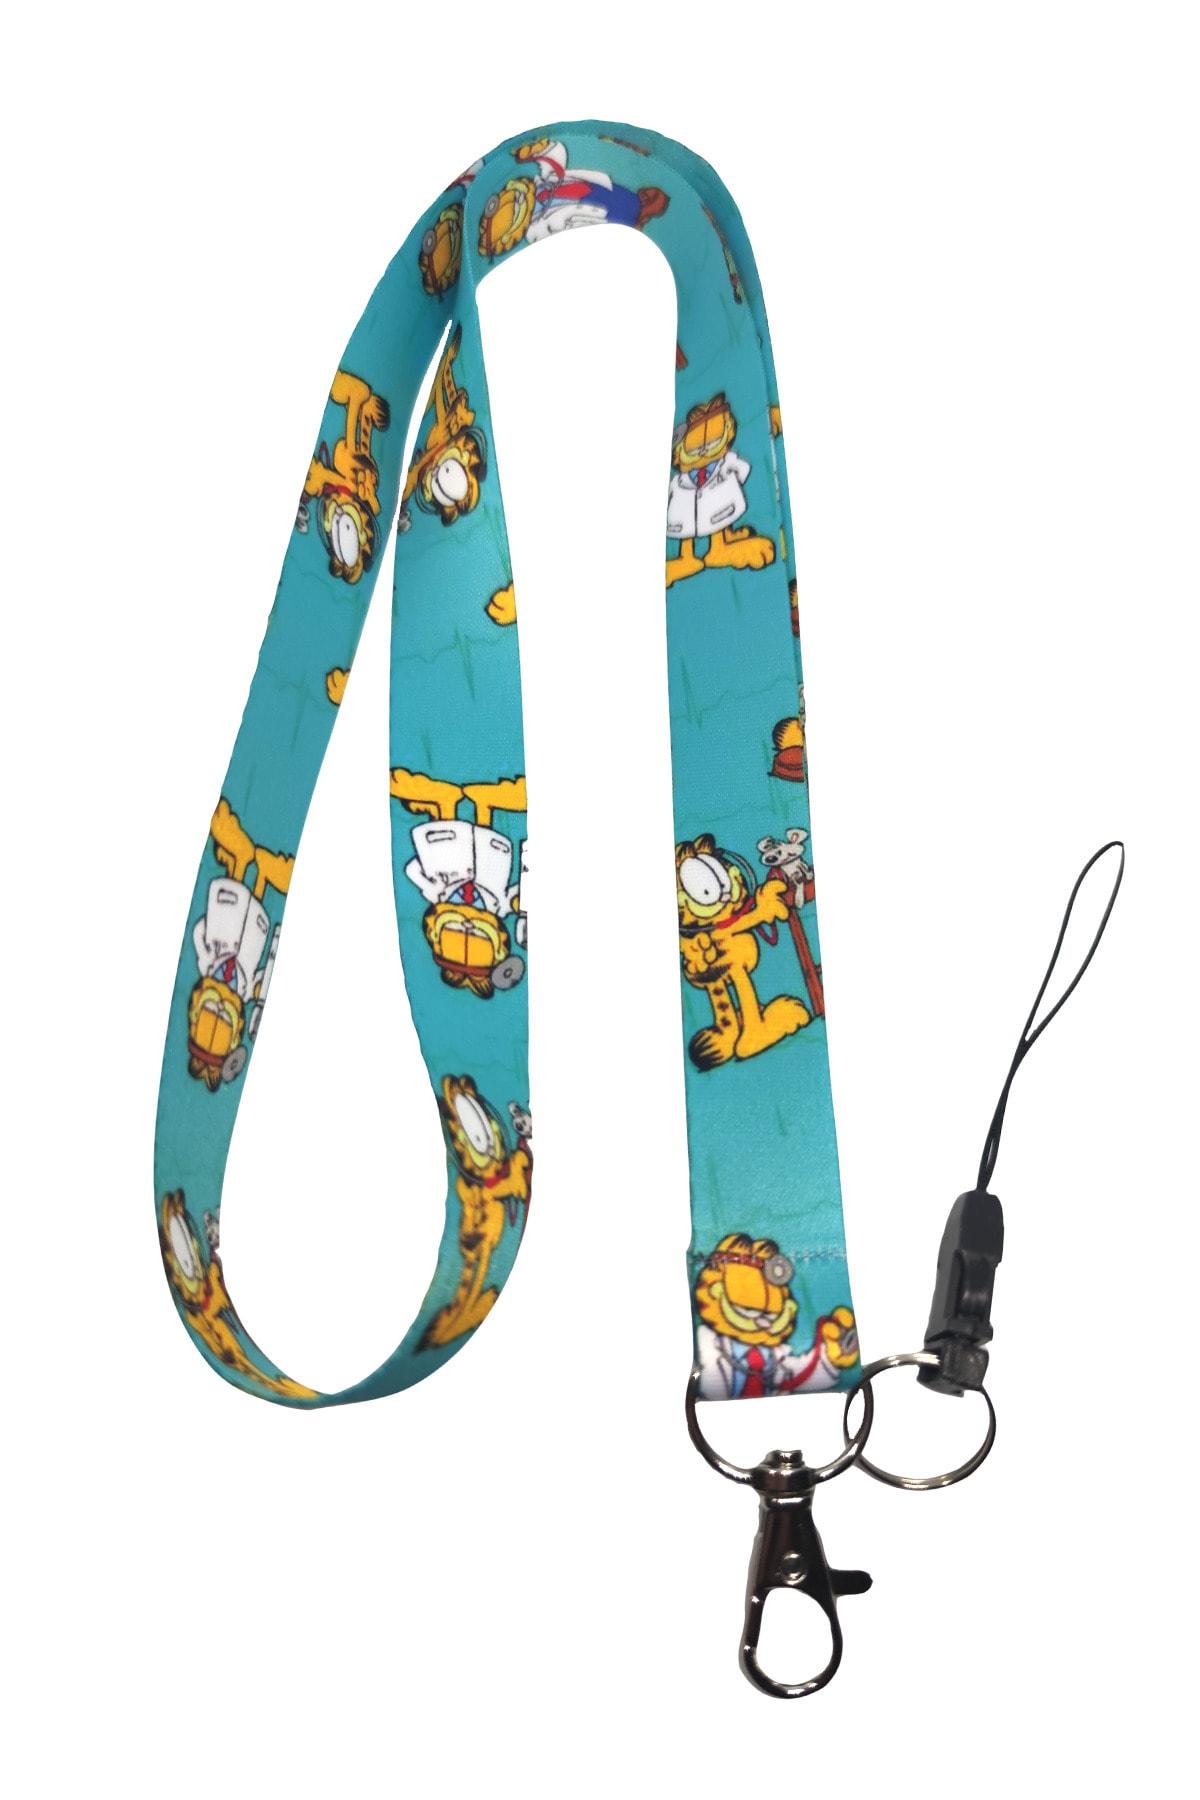 StormiStoretr Garfield Desenli Limited Edition Boyun Ipi Telefon Askısı 1